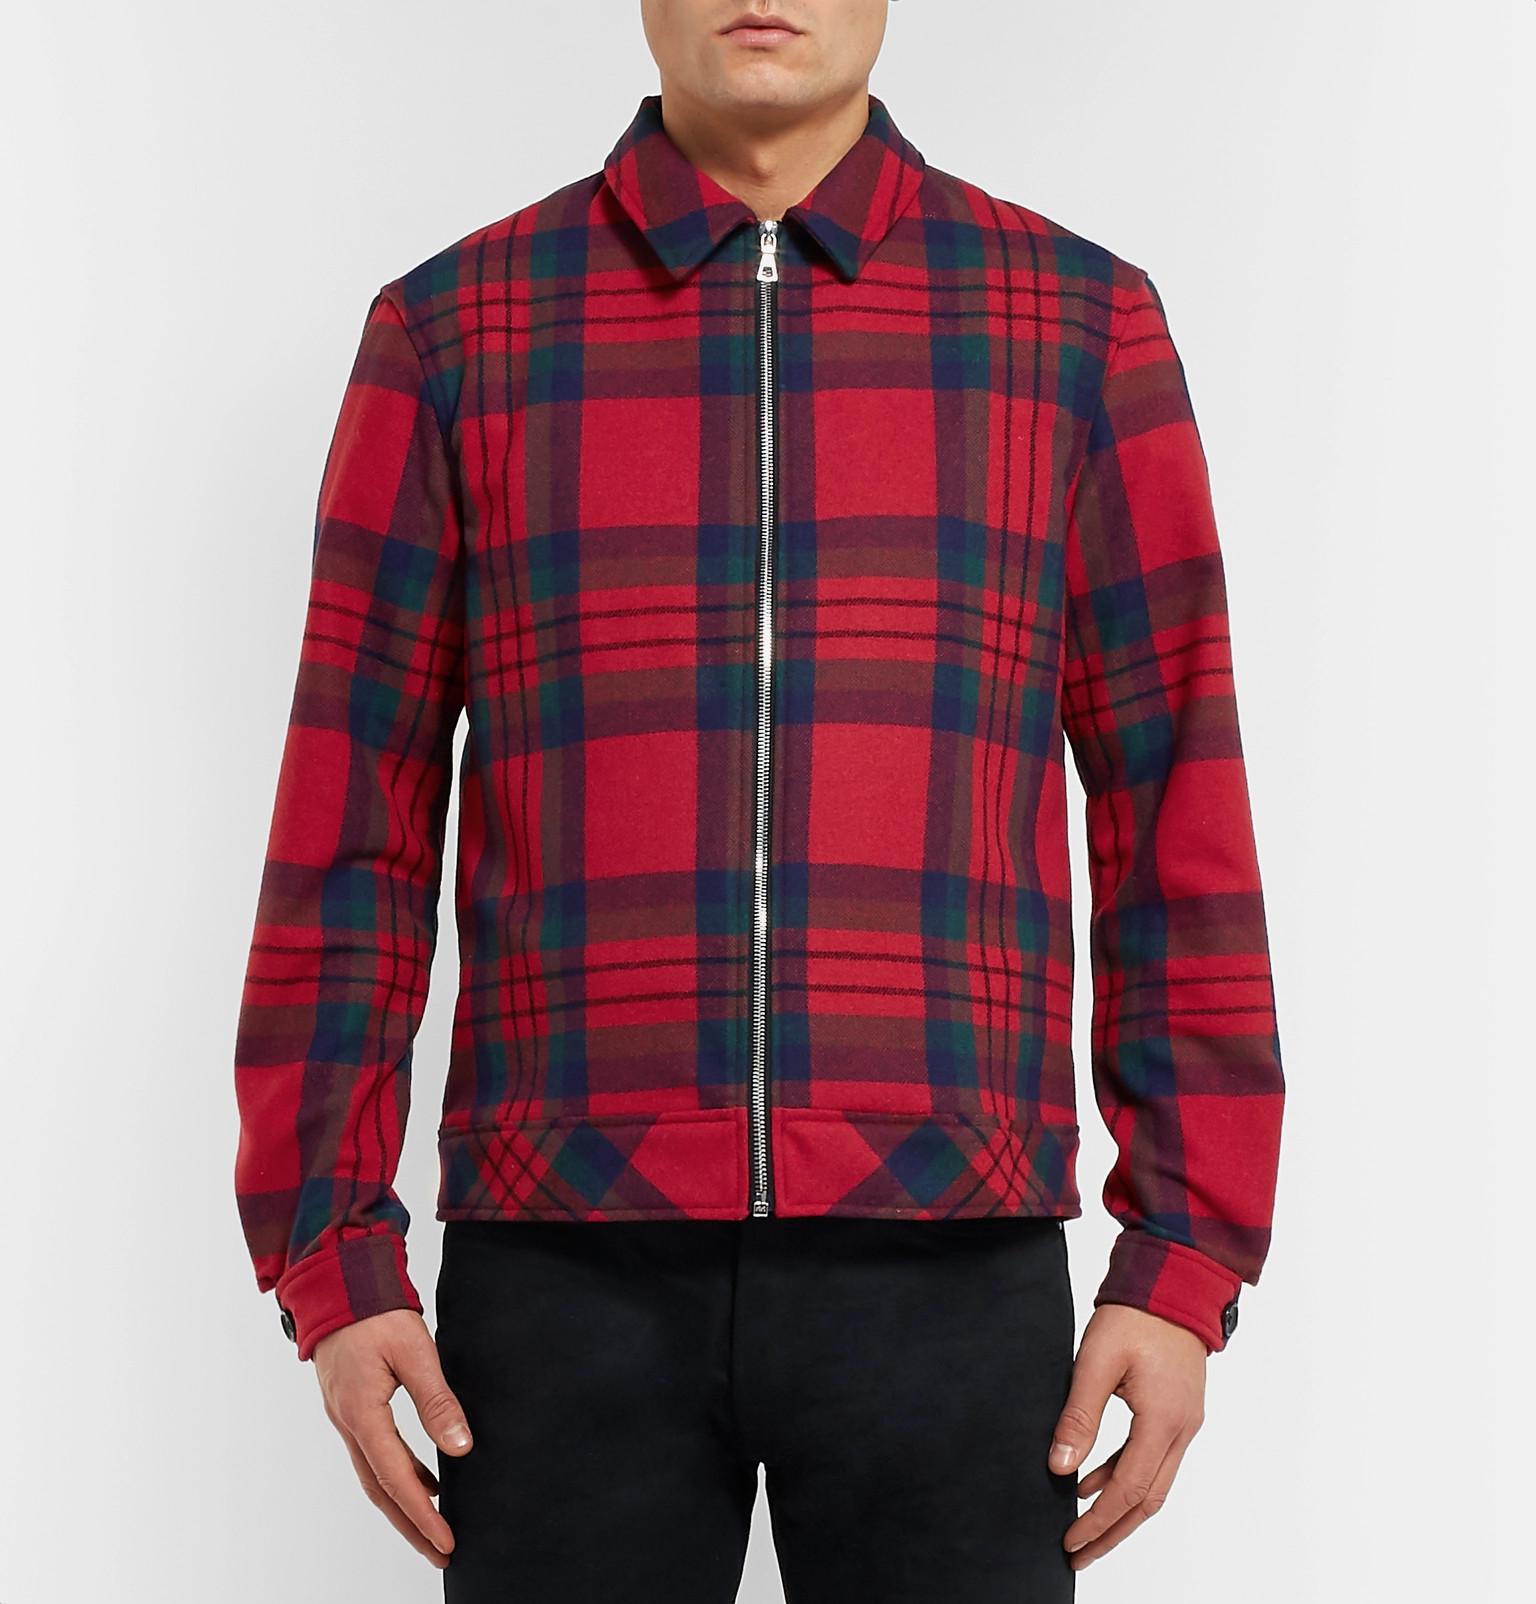 Wool Jacket Blouson Blend Elliottchecked John HwqXF4